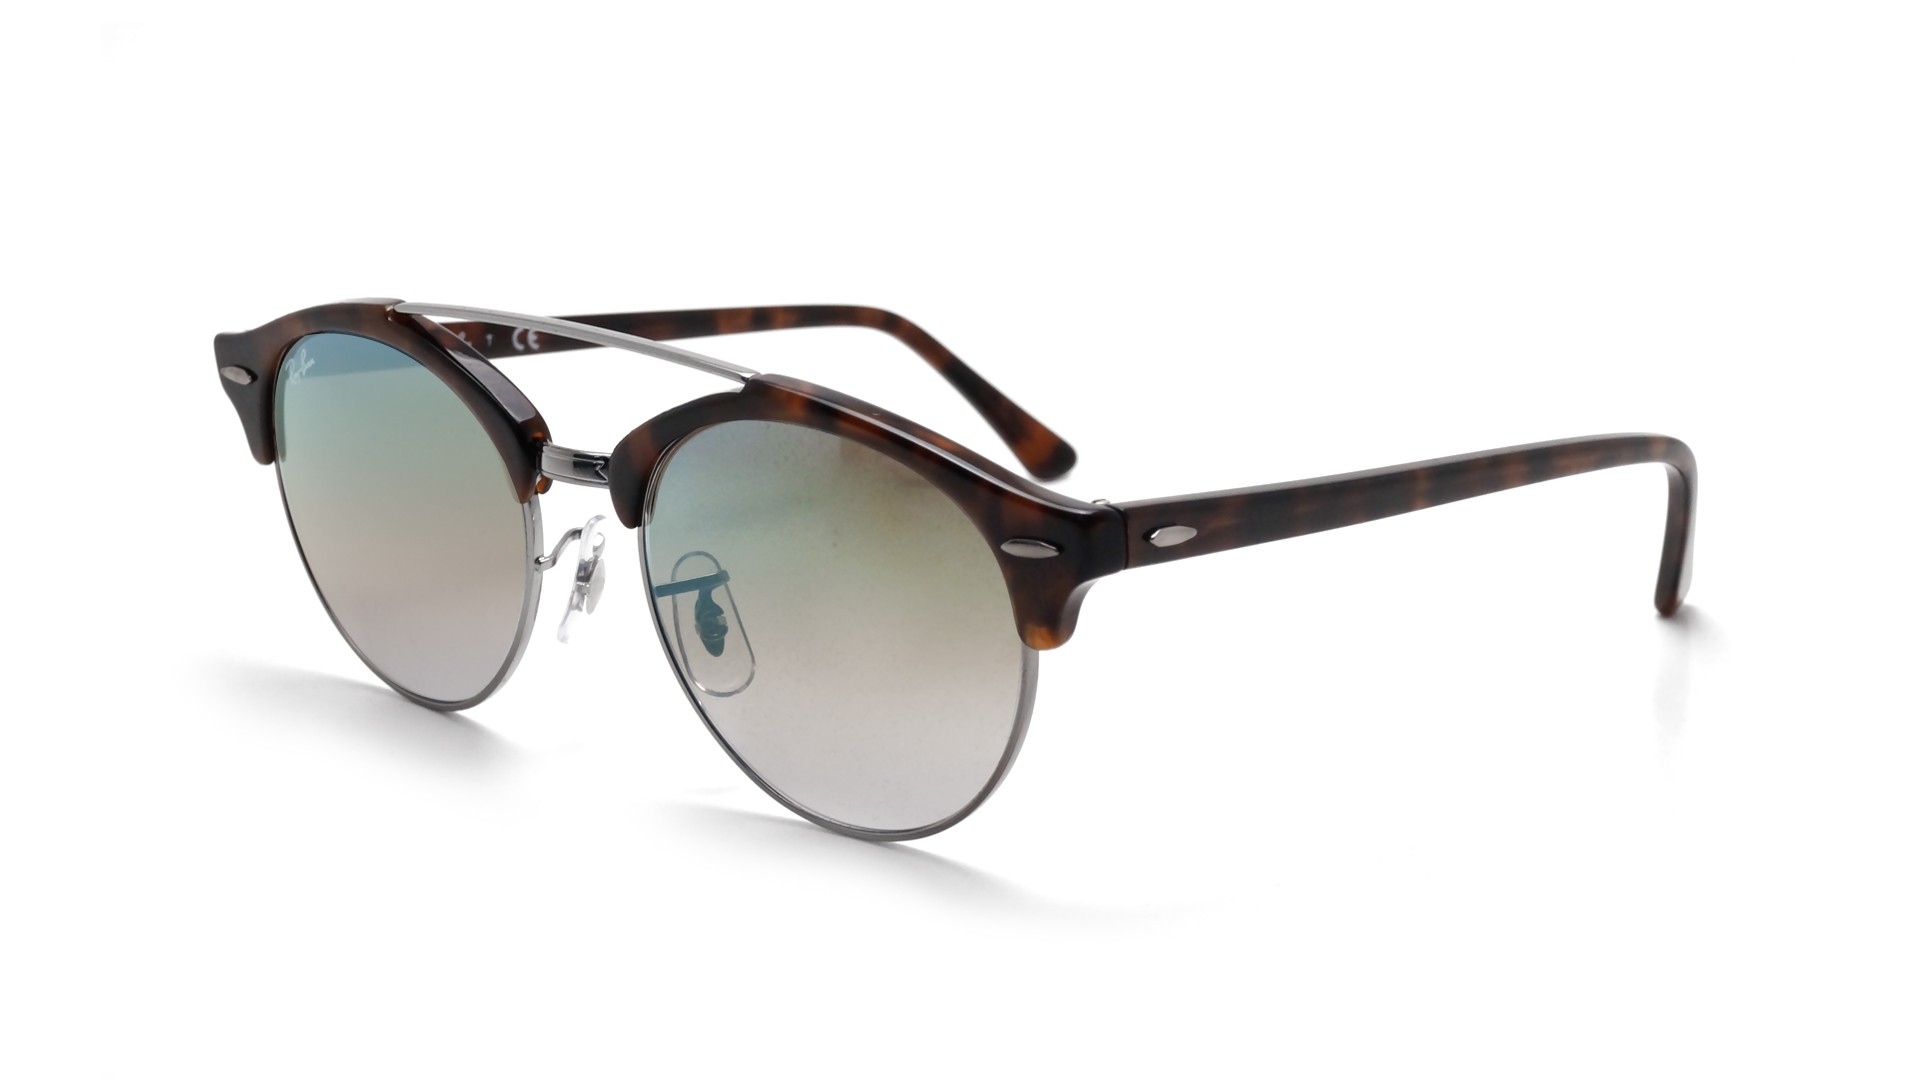 b54f3ab8a2b850 Sunglasses Ray-Ban Clubround double bridge Tortoise RB4346 62519J 51-19  Medium Mirror